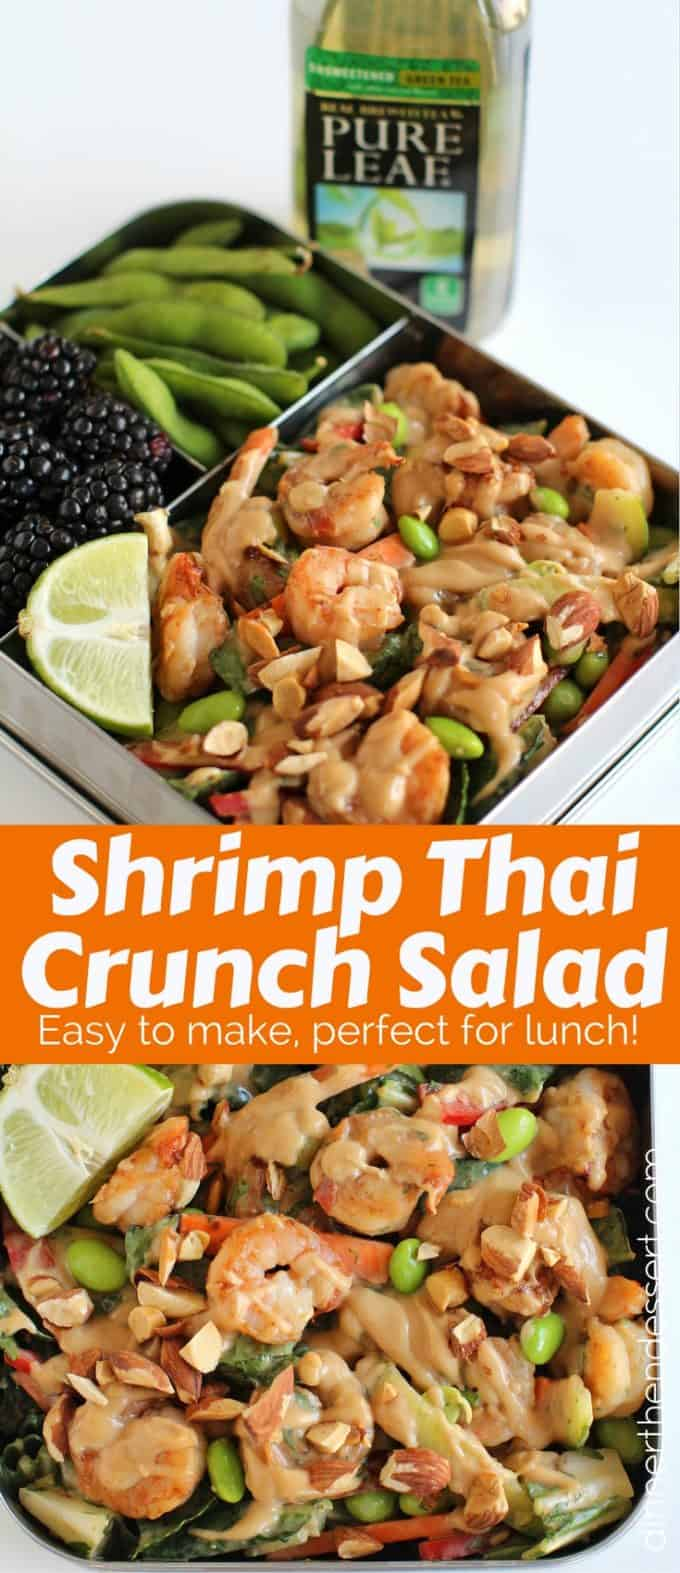 Shrimp Thai Crunch Salad made with a delicious and EASY peanut sesame dressing.